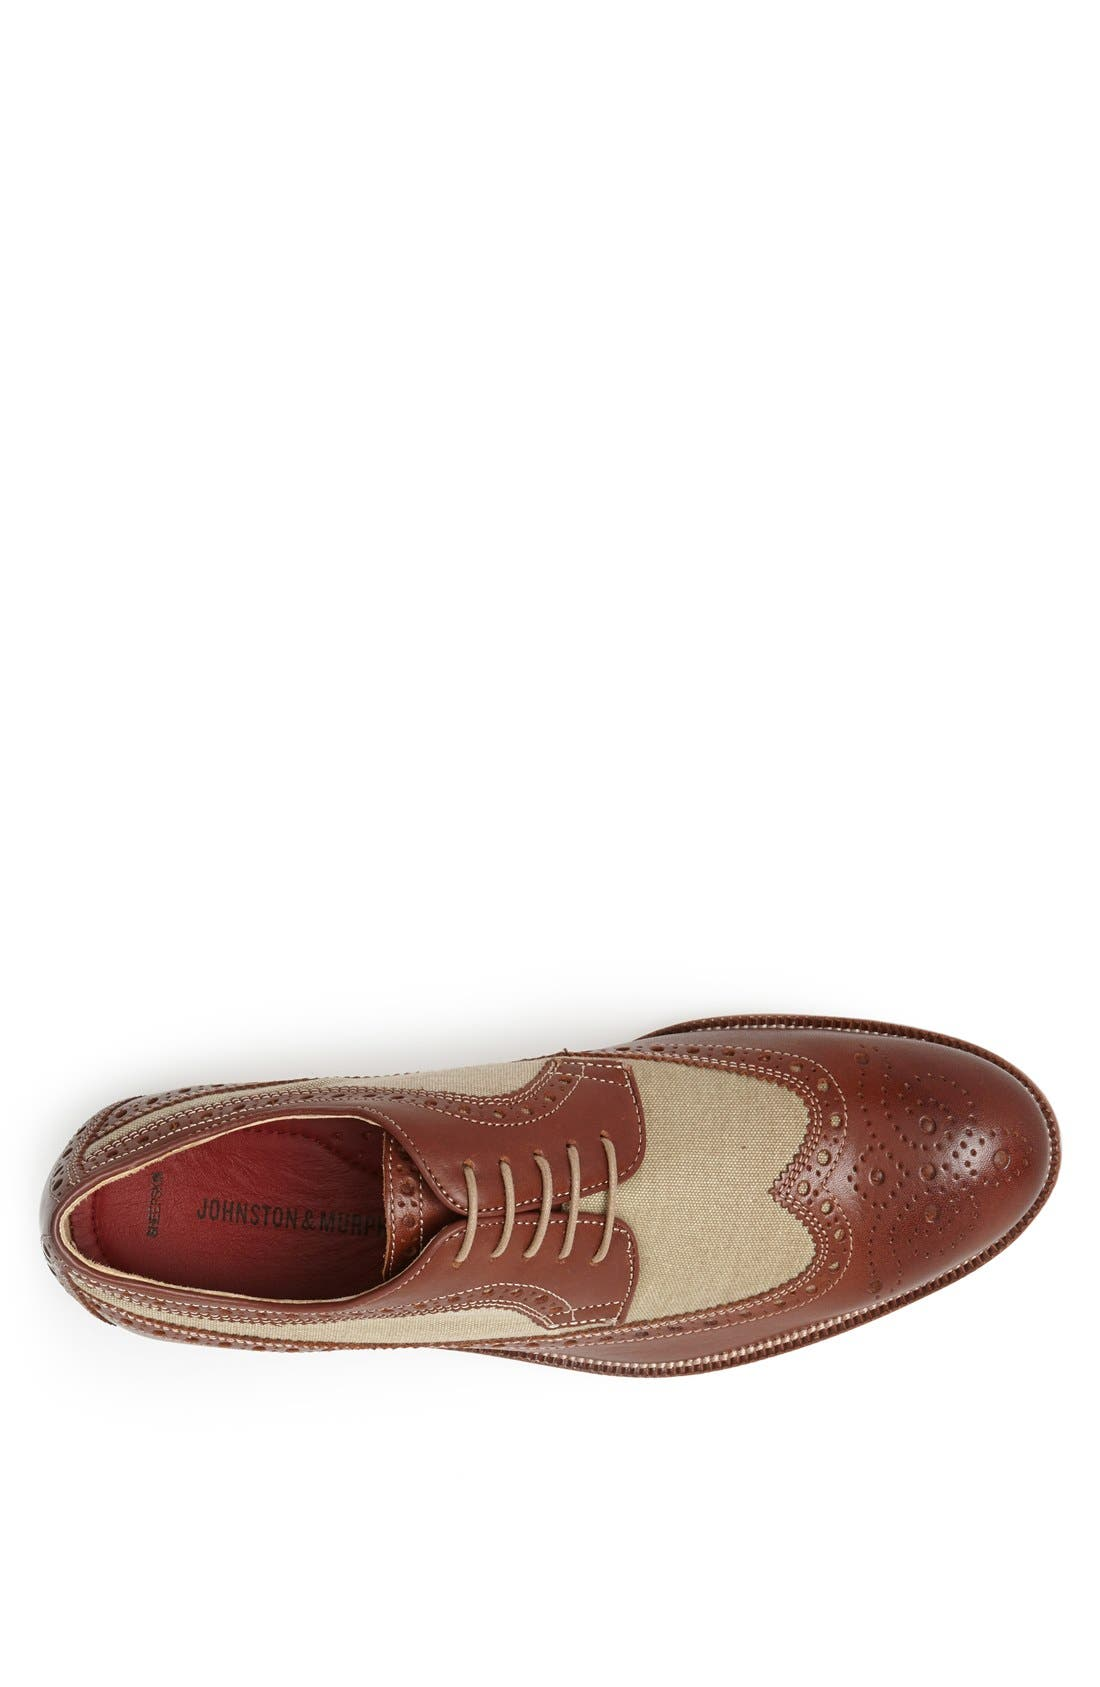 Alternate Image 3  - Johnston & Murphy 'Clayton' Longwing Spectator Shoe (Online Only)